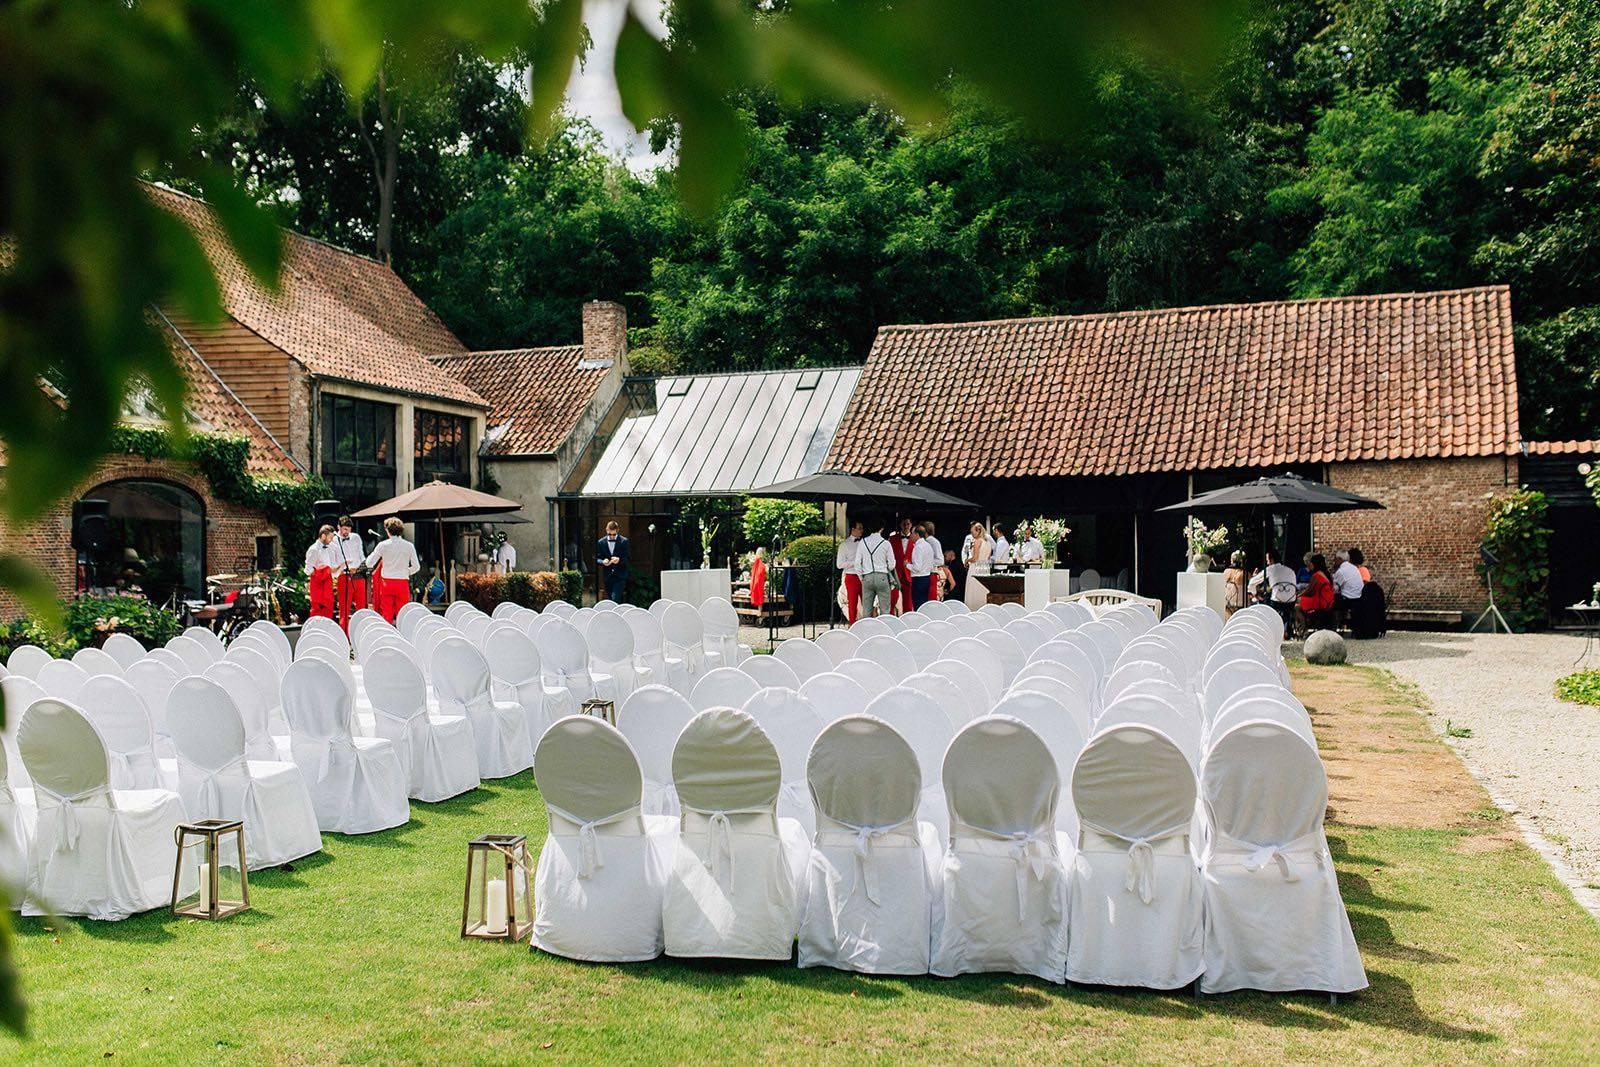 Flinckheuvel - Feestzaal 's Gravenwezel -  House of Weddings - 13